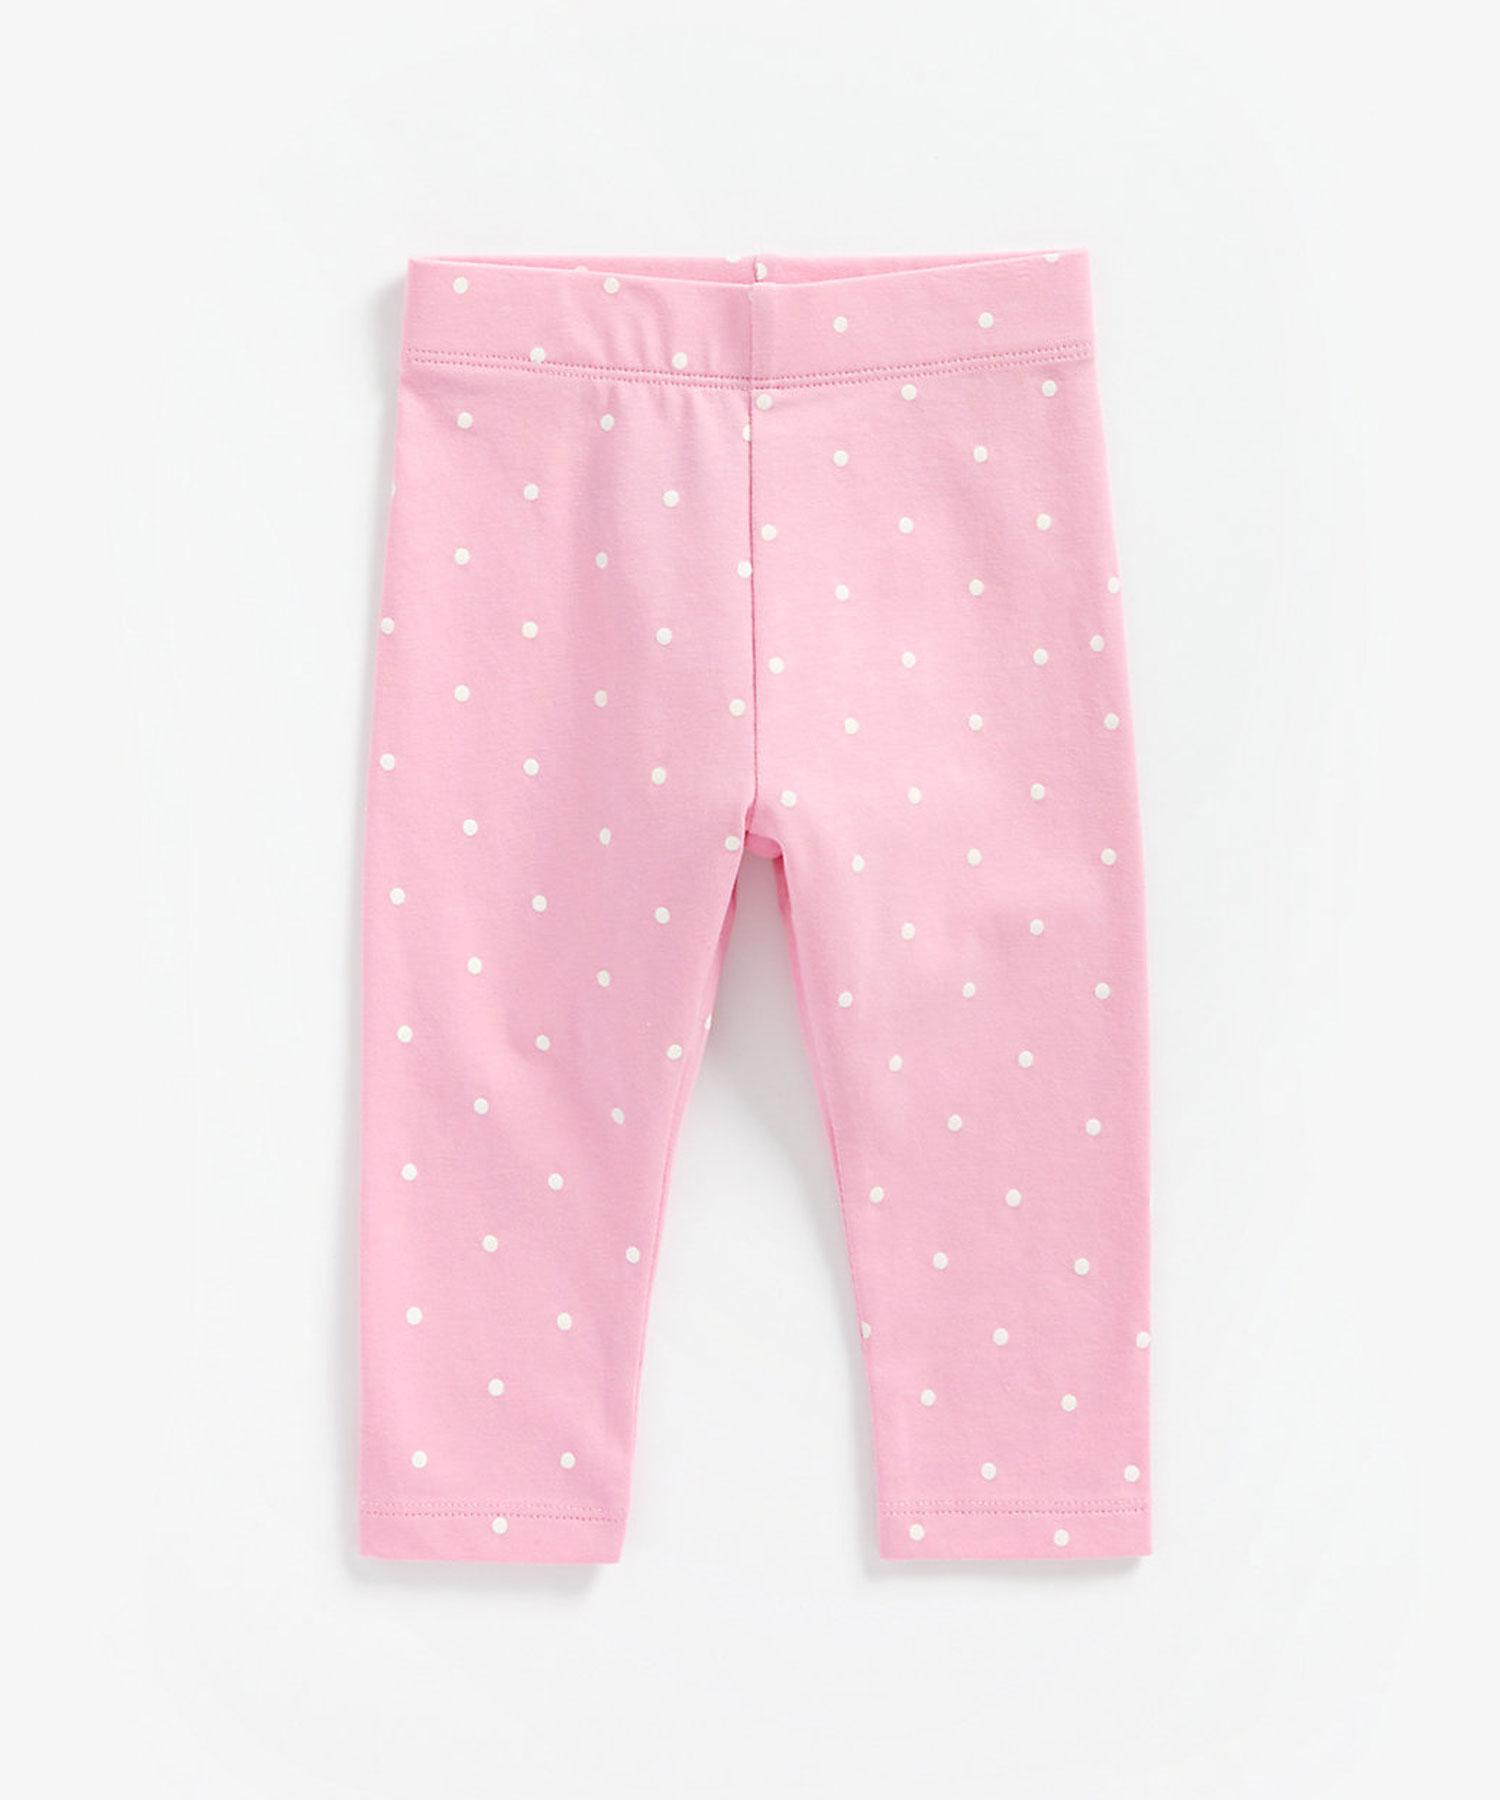 Mothercare | Girls Leggings Polka Dot Print - Pink